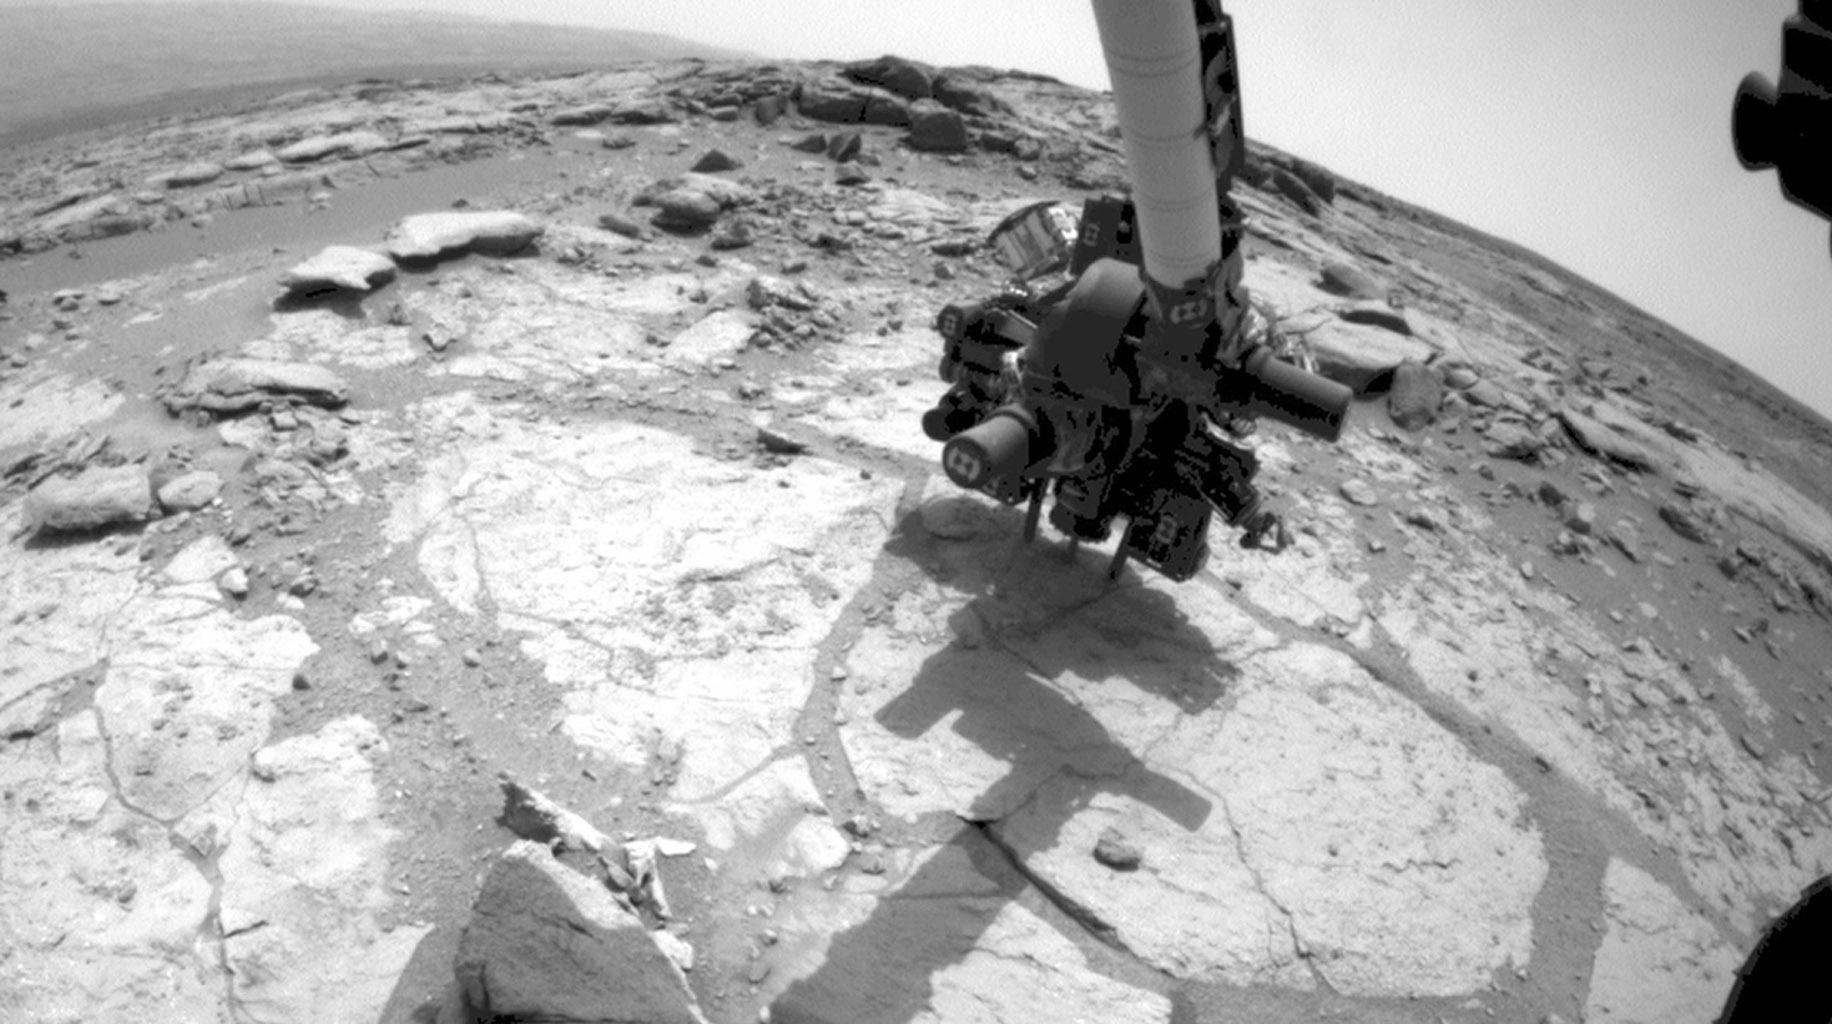 mars rover speed - photo #23